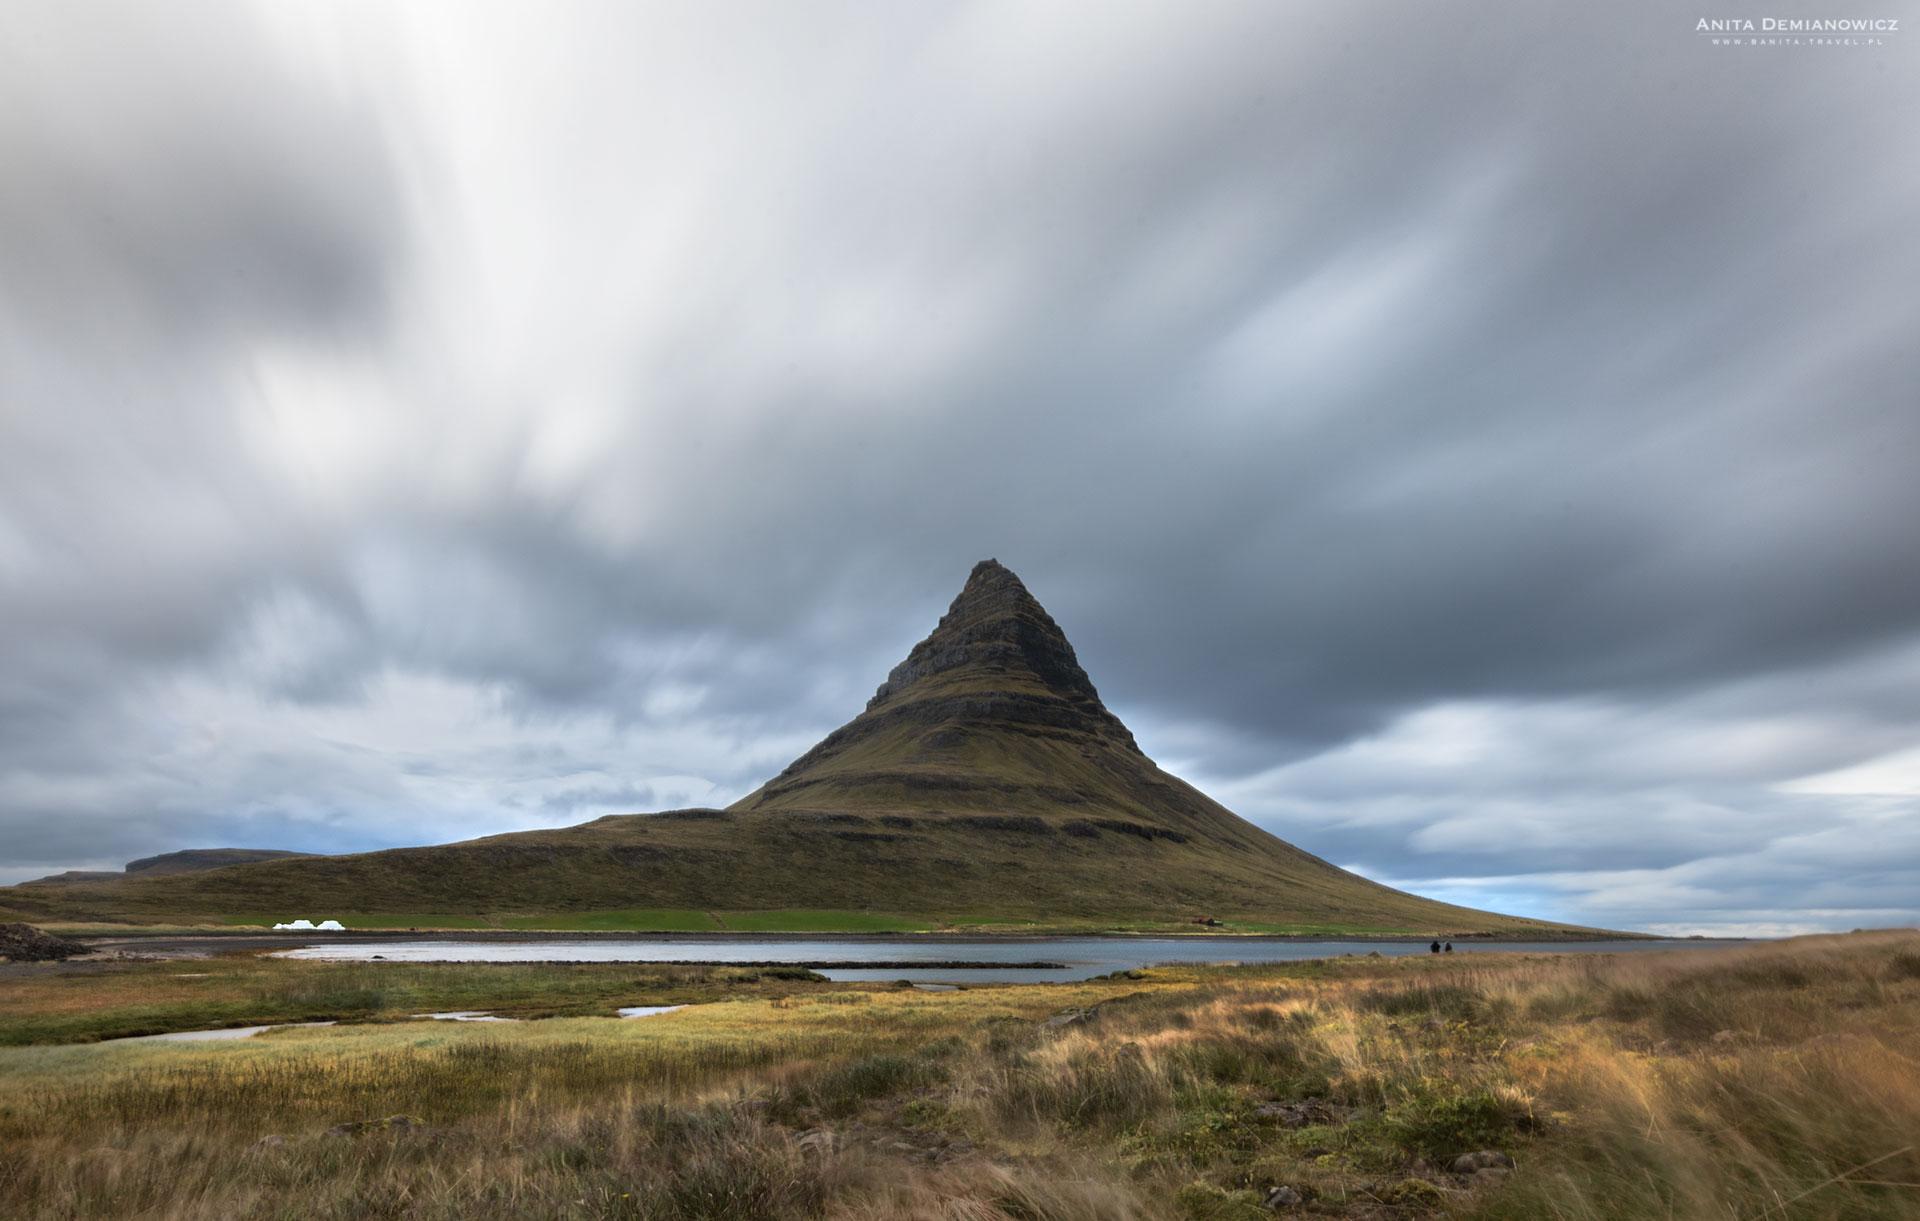 Kirkjufel Mountain, Islandia, Anita Demianowicz